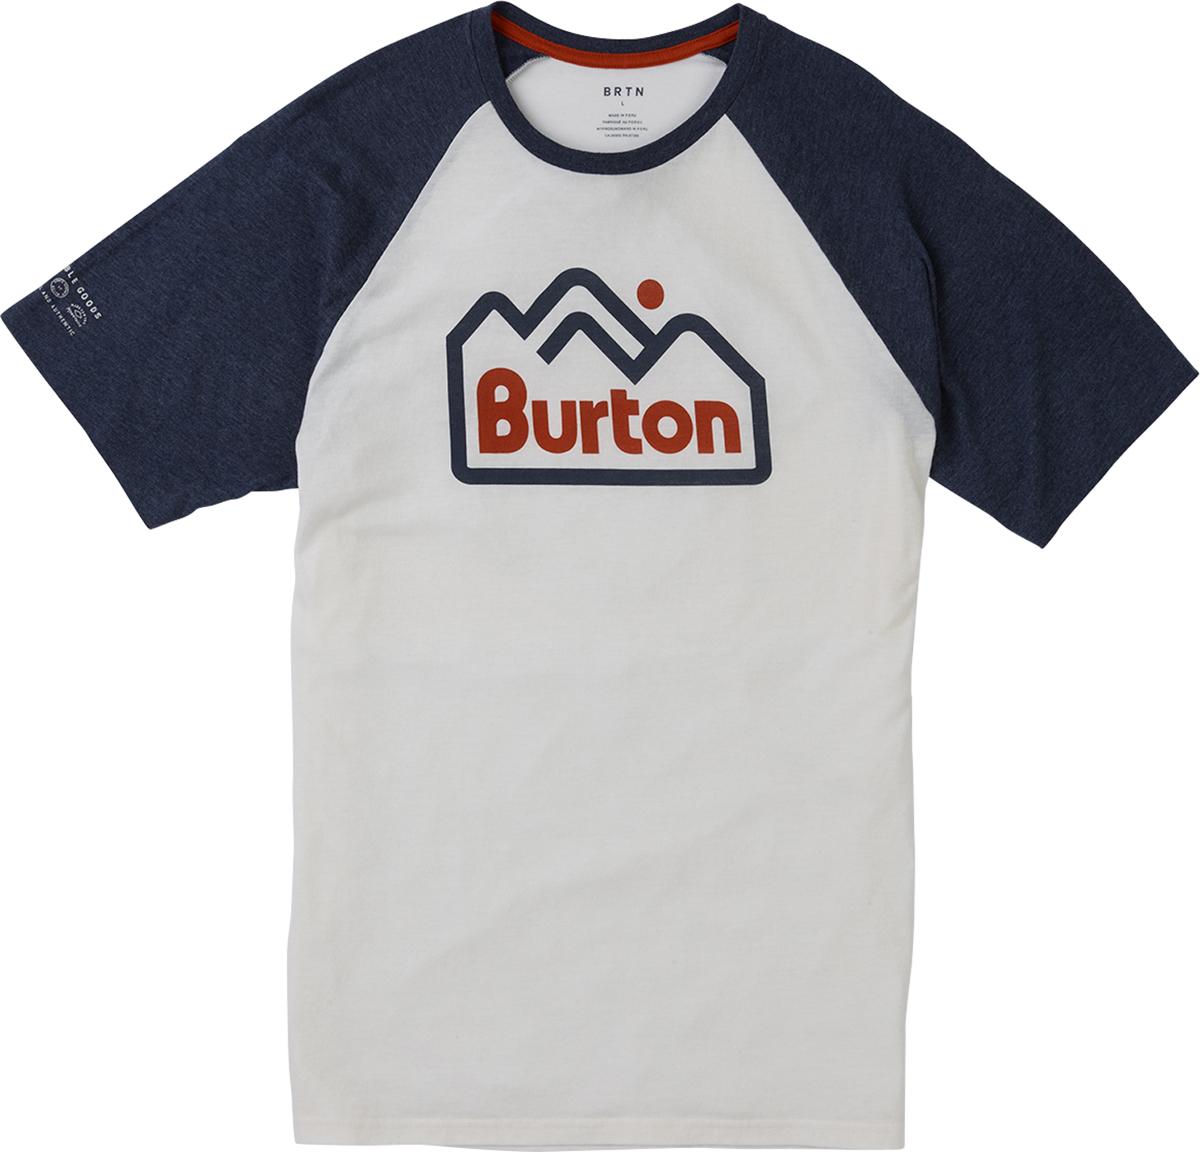 Футболка мужская Burton Mb Mtnjack Active, цвет: белый. 17877102100. Размер XL (52) burton термобелье burton midweight base layer pant true black fw18 xl